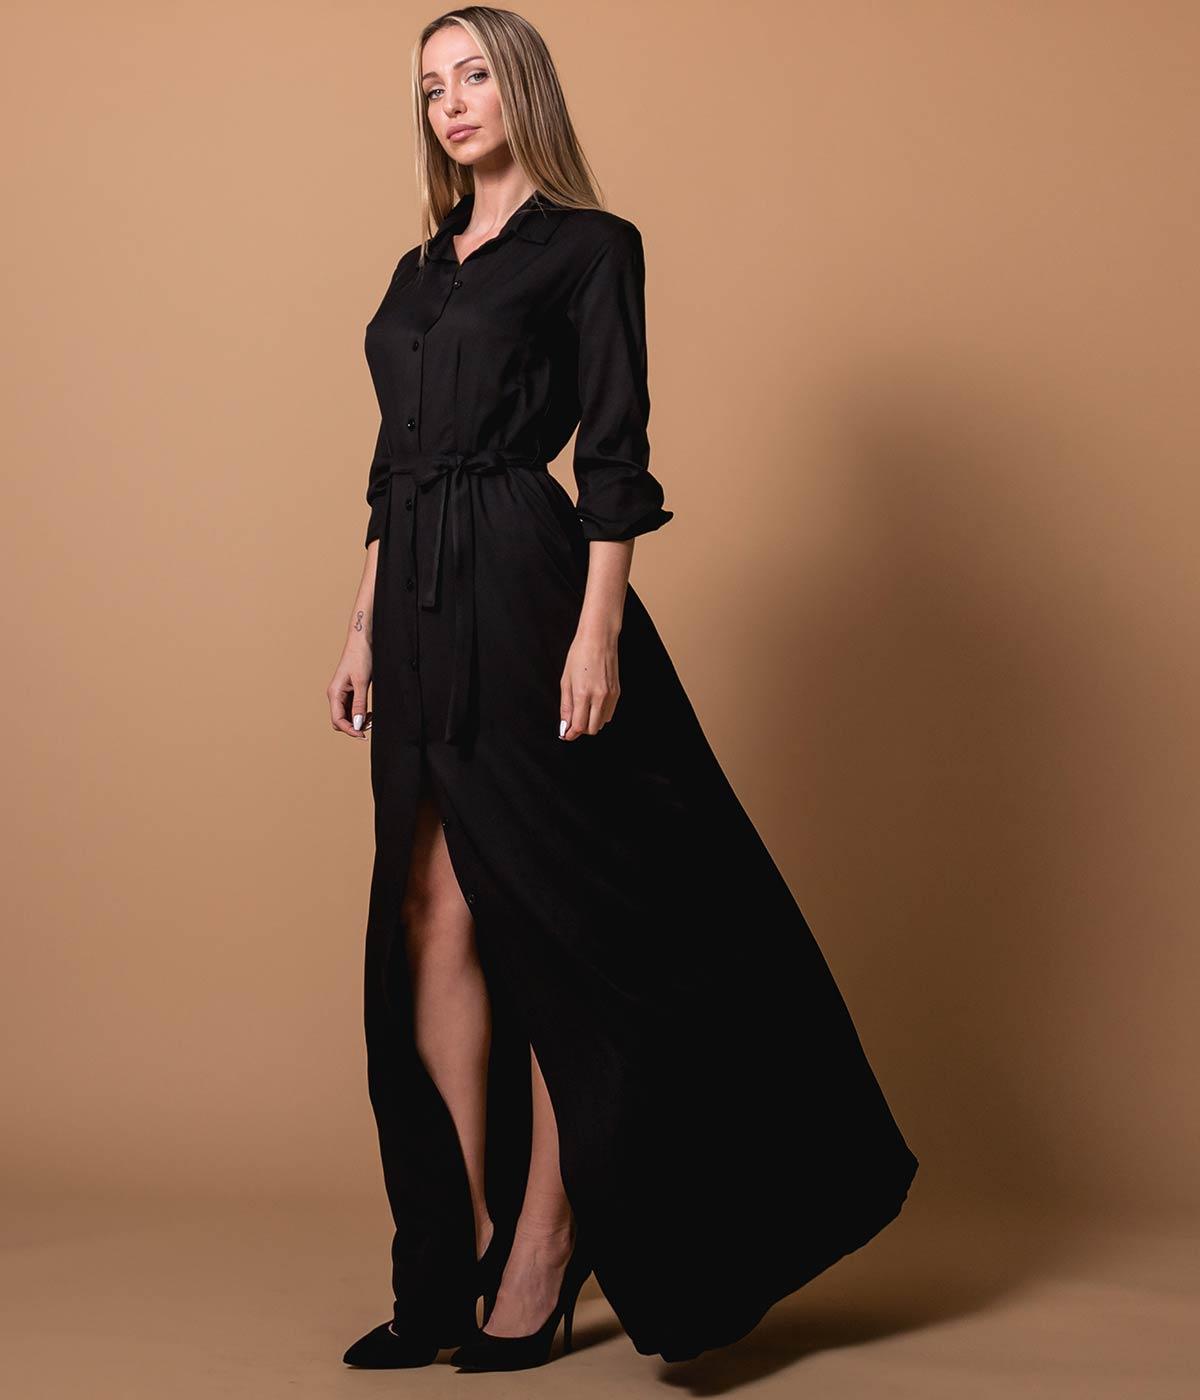 Sale Πουκάμισο Φόρεμα Μάξι με Κουμπιά - Μαύρο · Πουκάμισο ... 495ab142b82